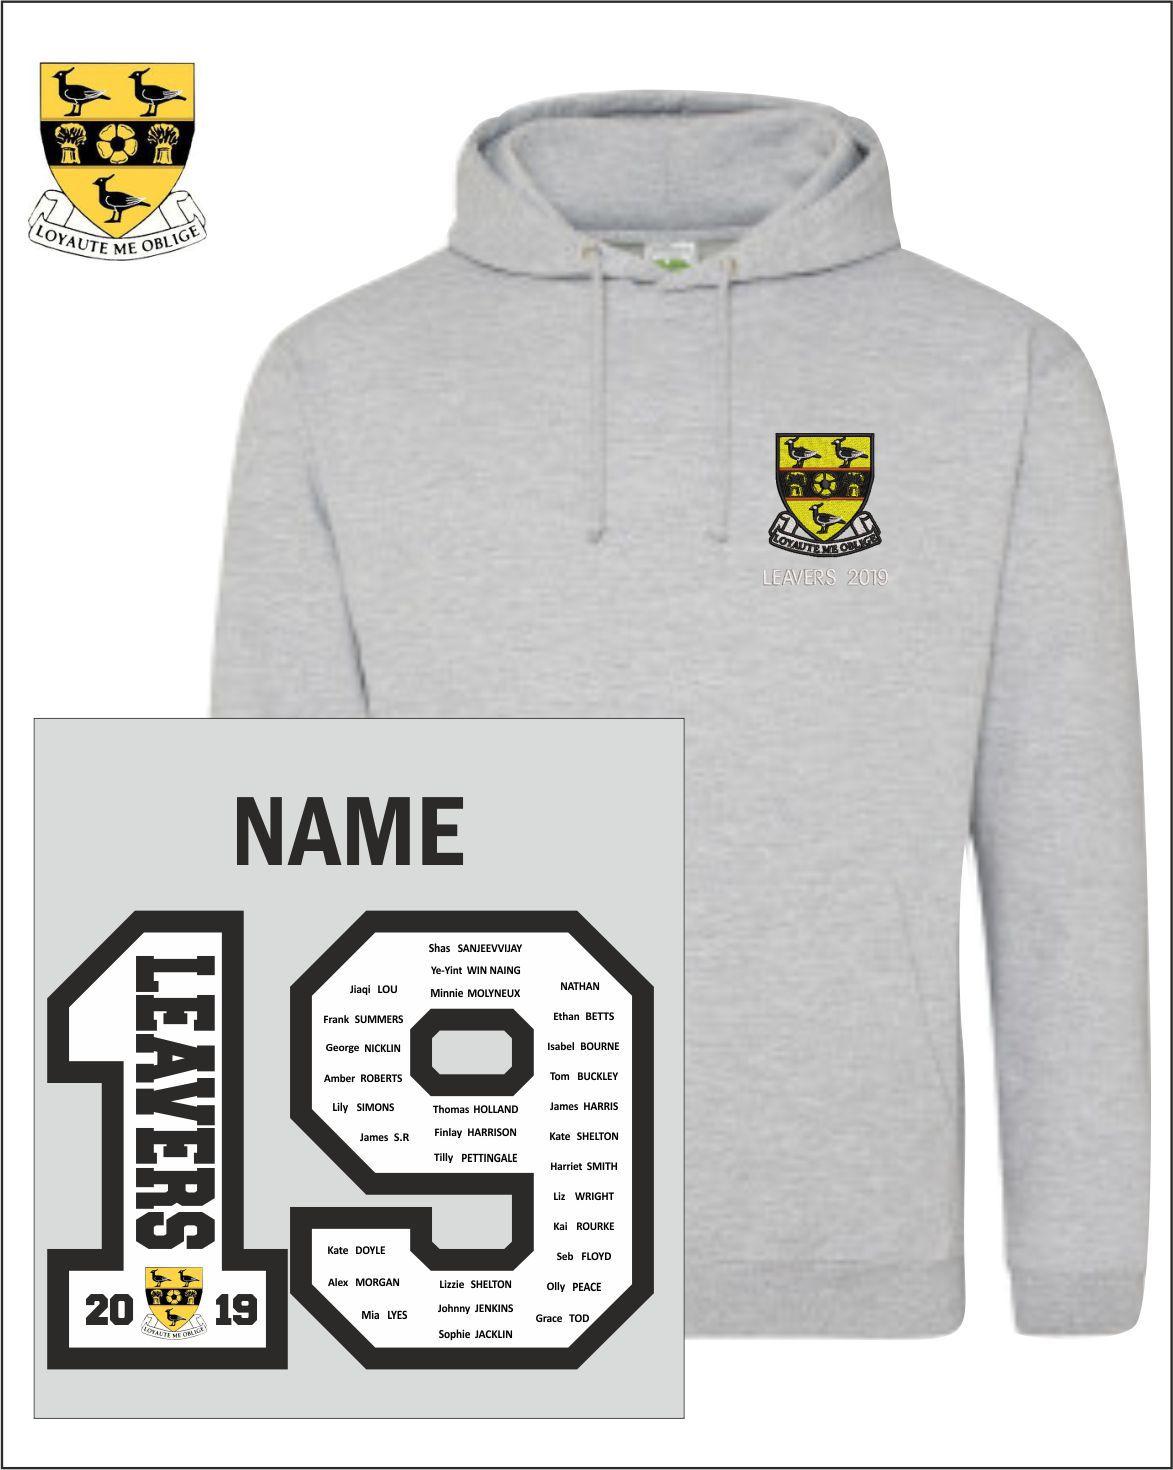 19 Sports Grey Hoody